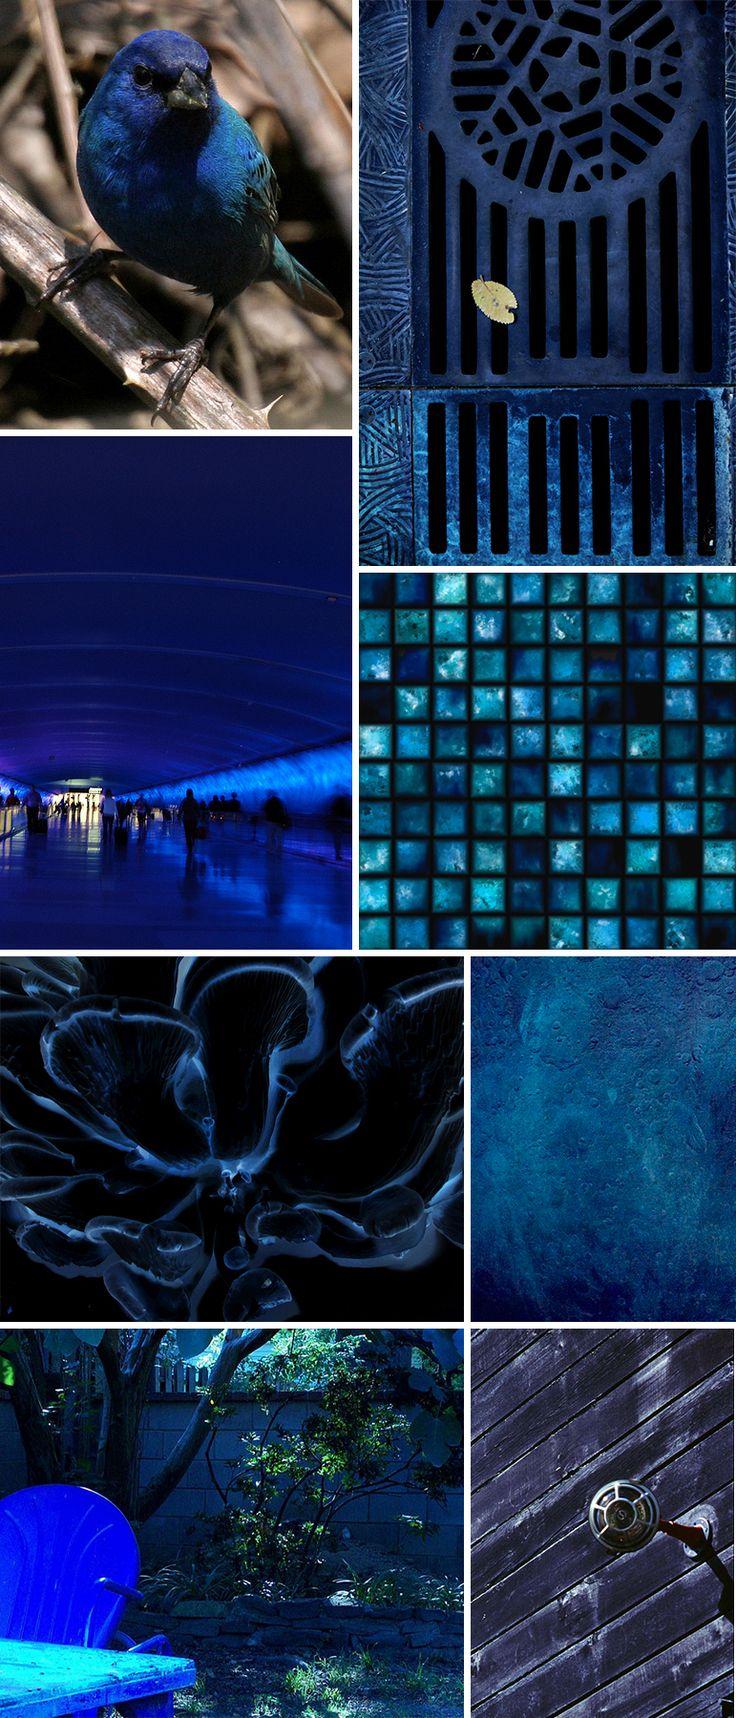 indigo from patternobserver